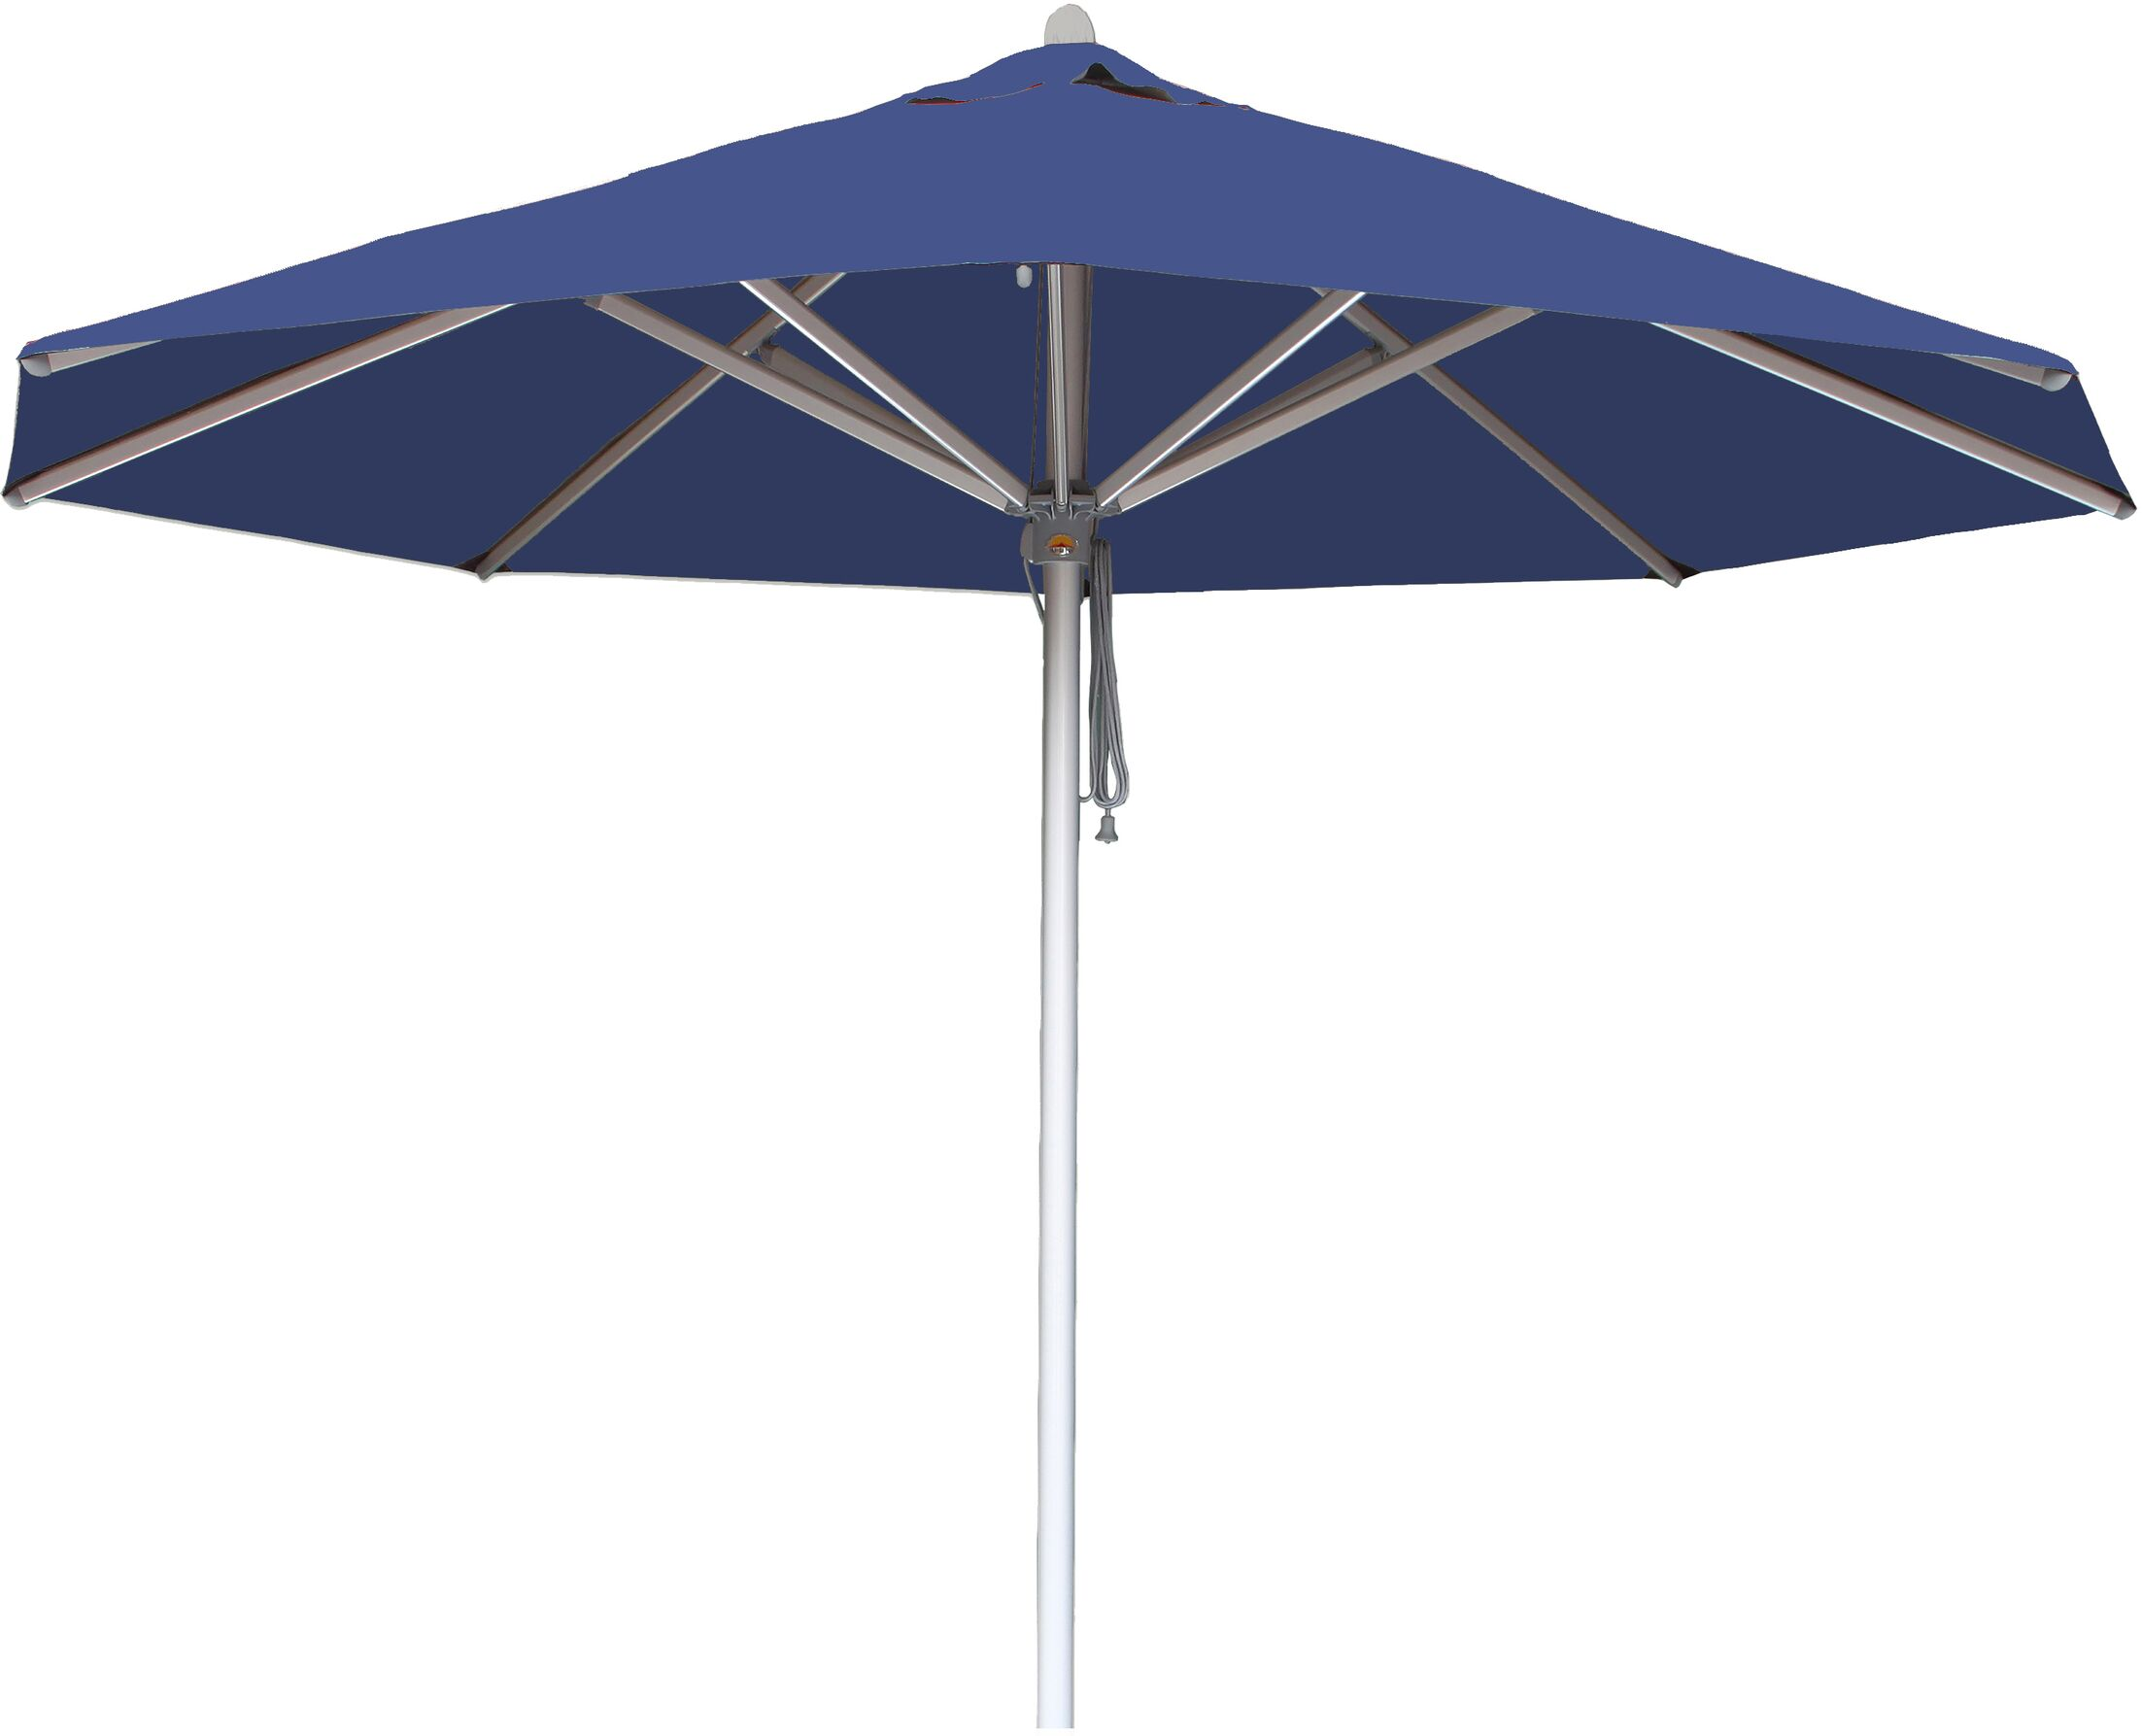 Hurricane 10' Market Umbrella Fabric: Blue